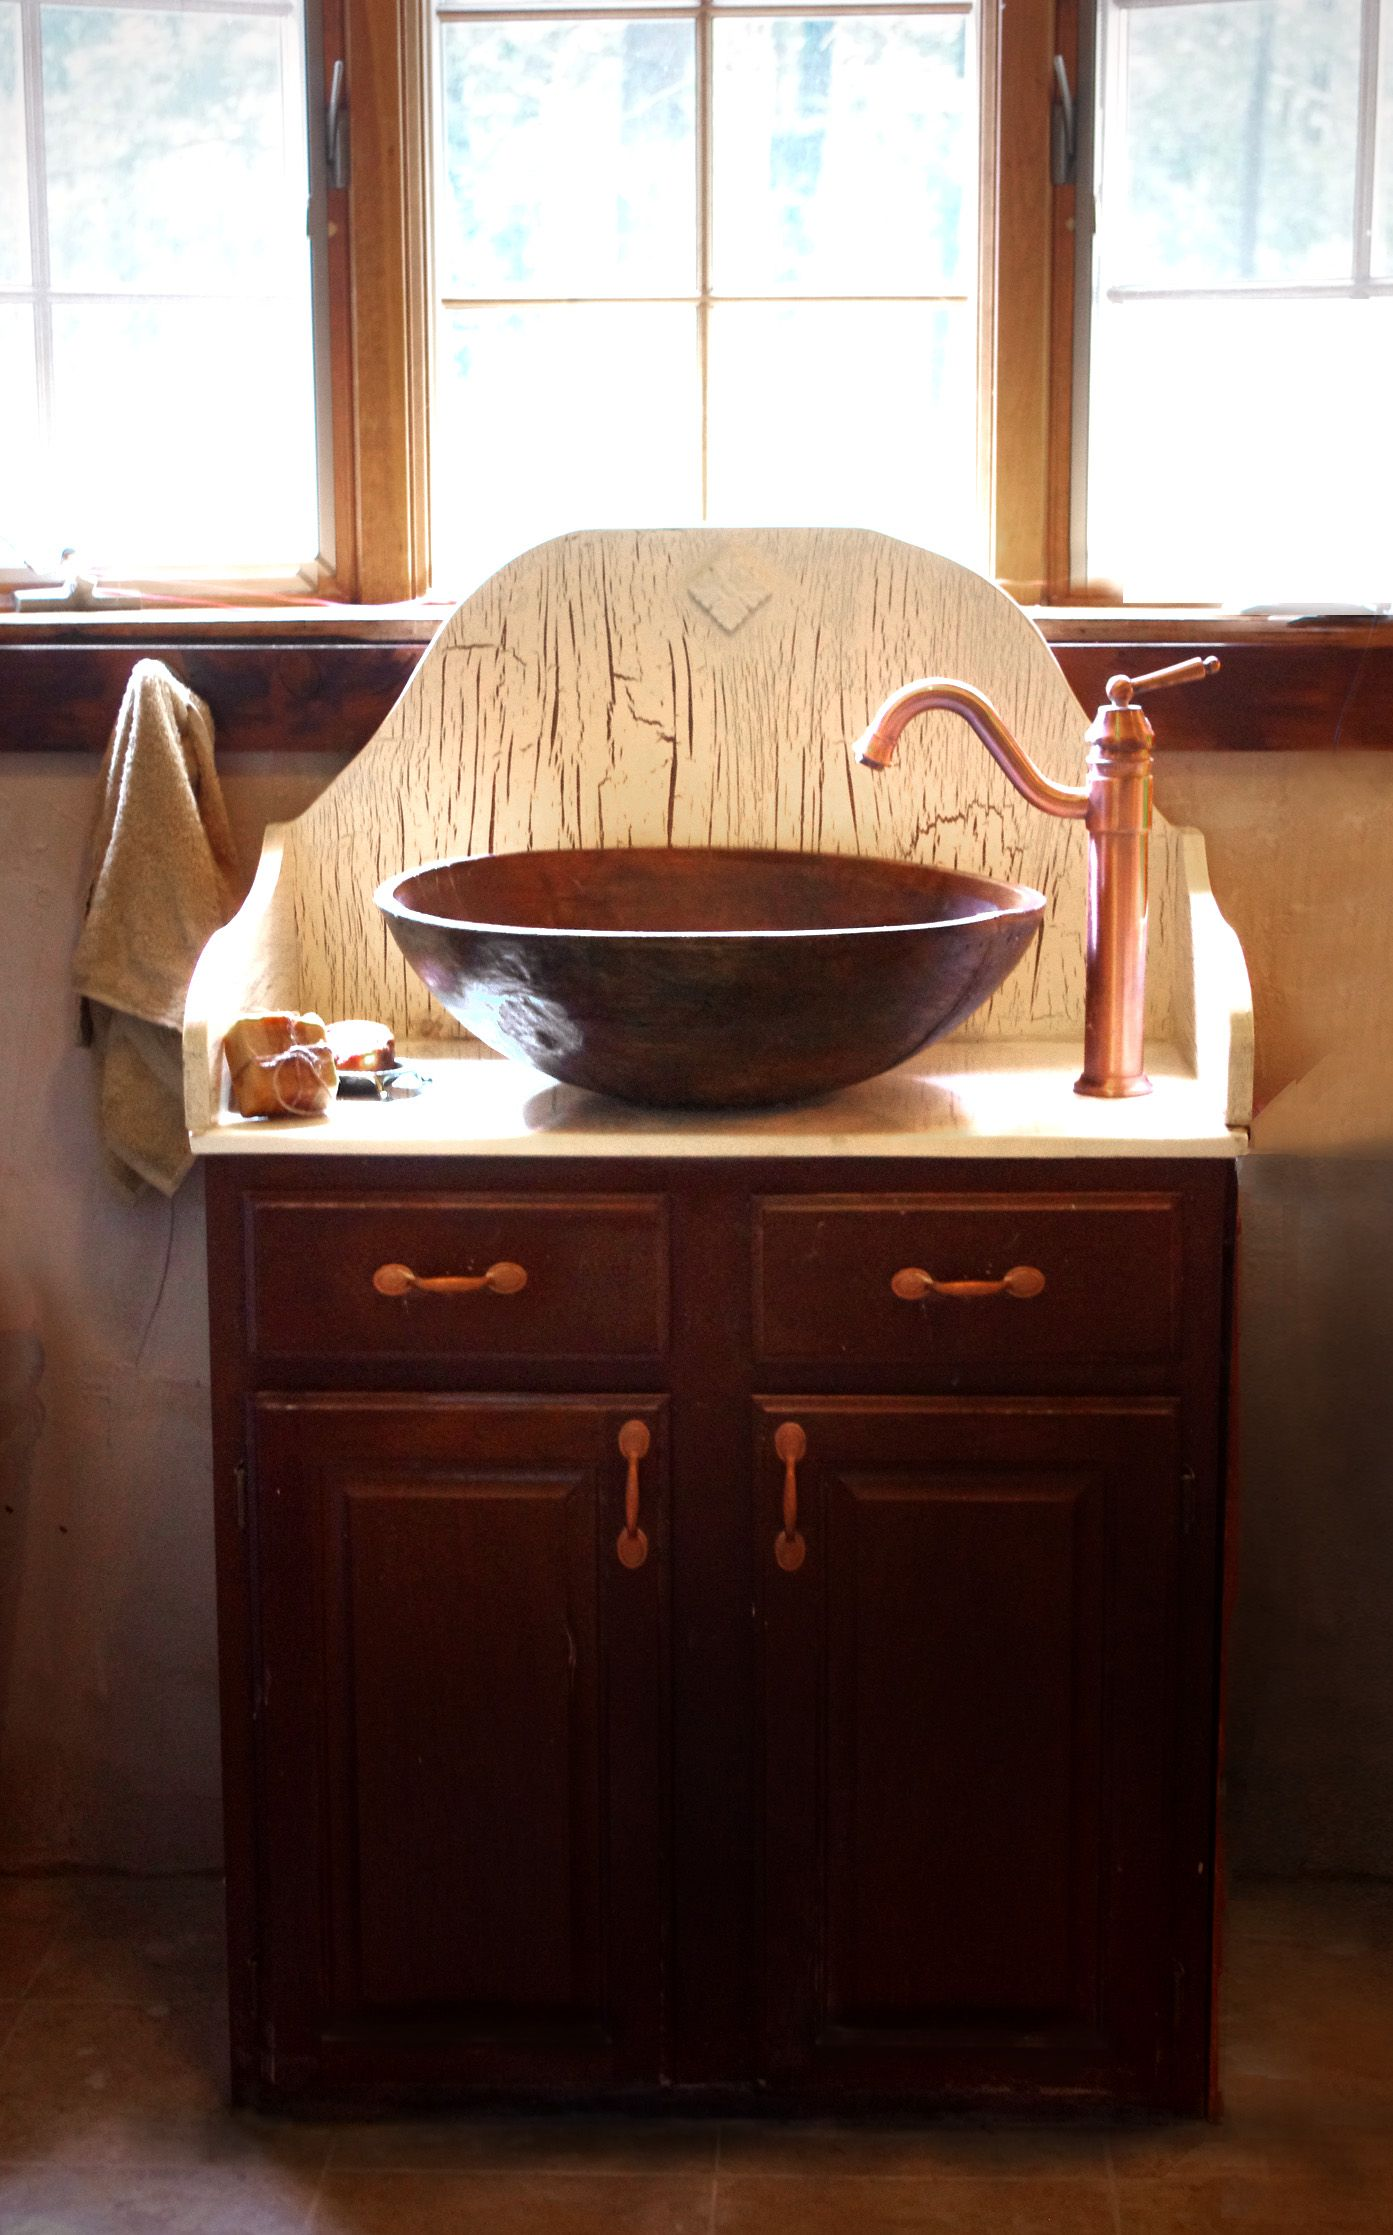 Diy Your Own Vessel Sink Upstairs Inspiration Bathroom Vintage Bathroom Sinks Bathroom